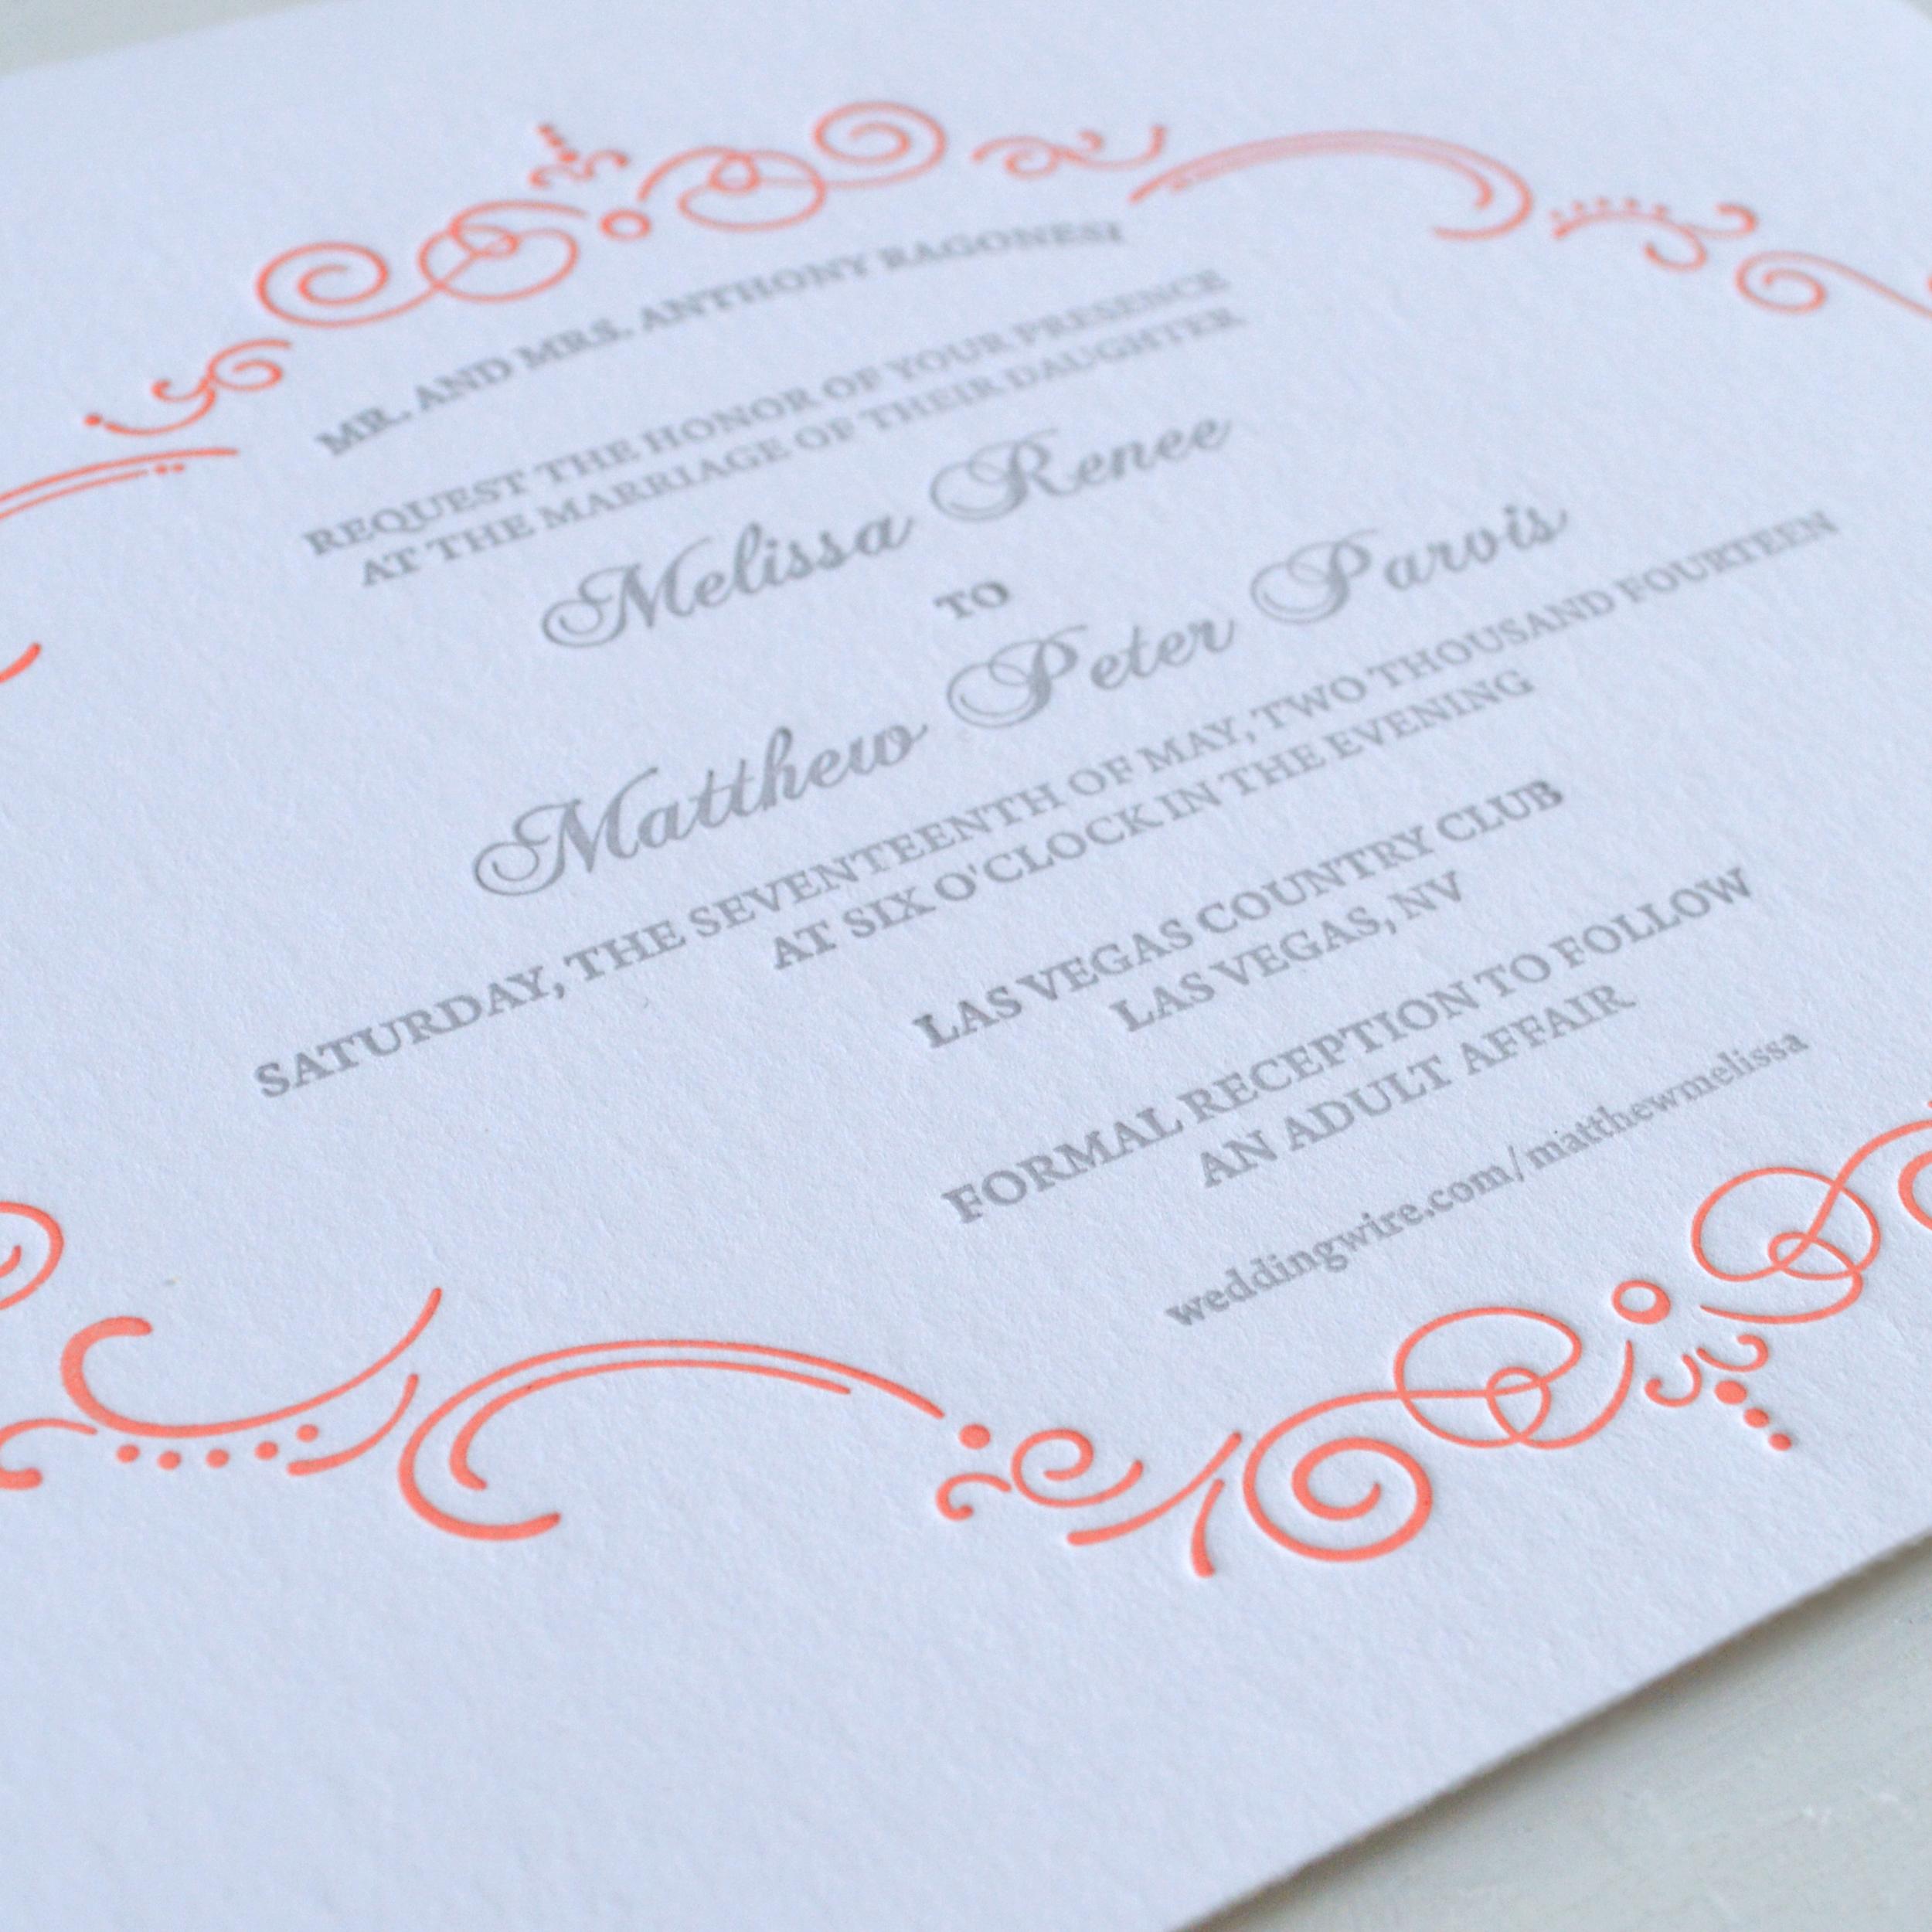 coral_wedding_invitation_letterpress_cu.jpg